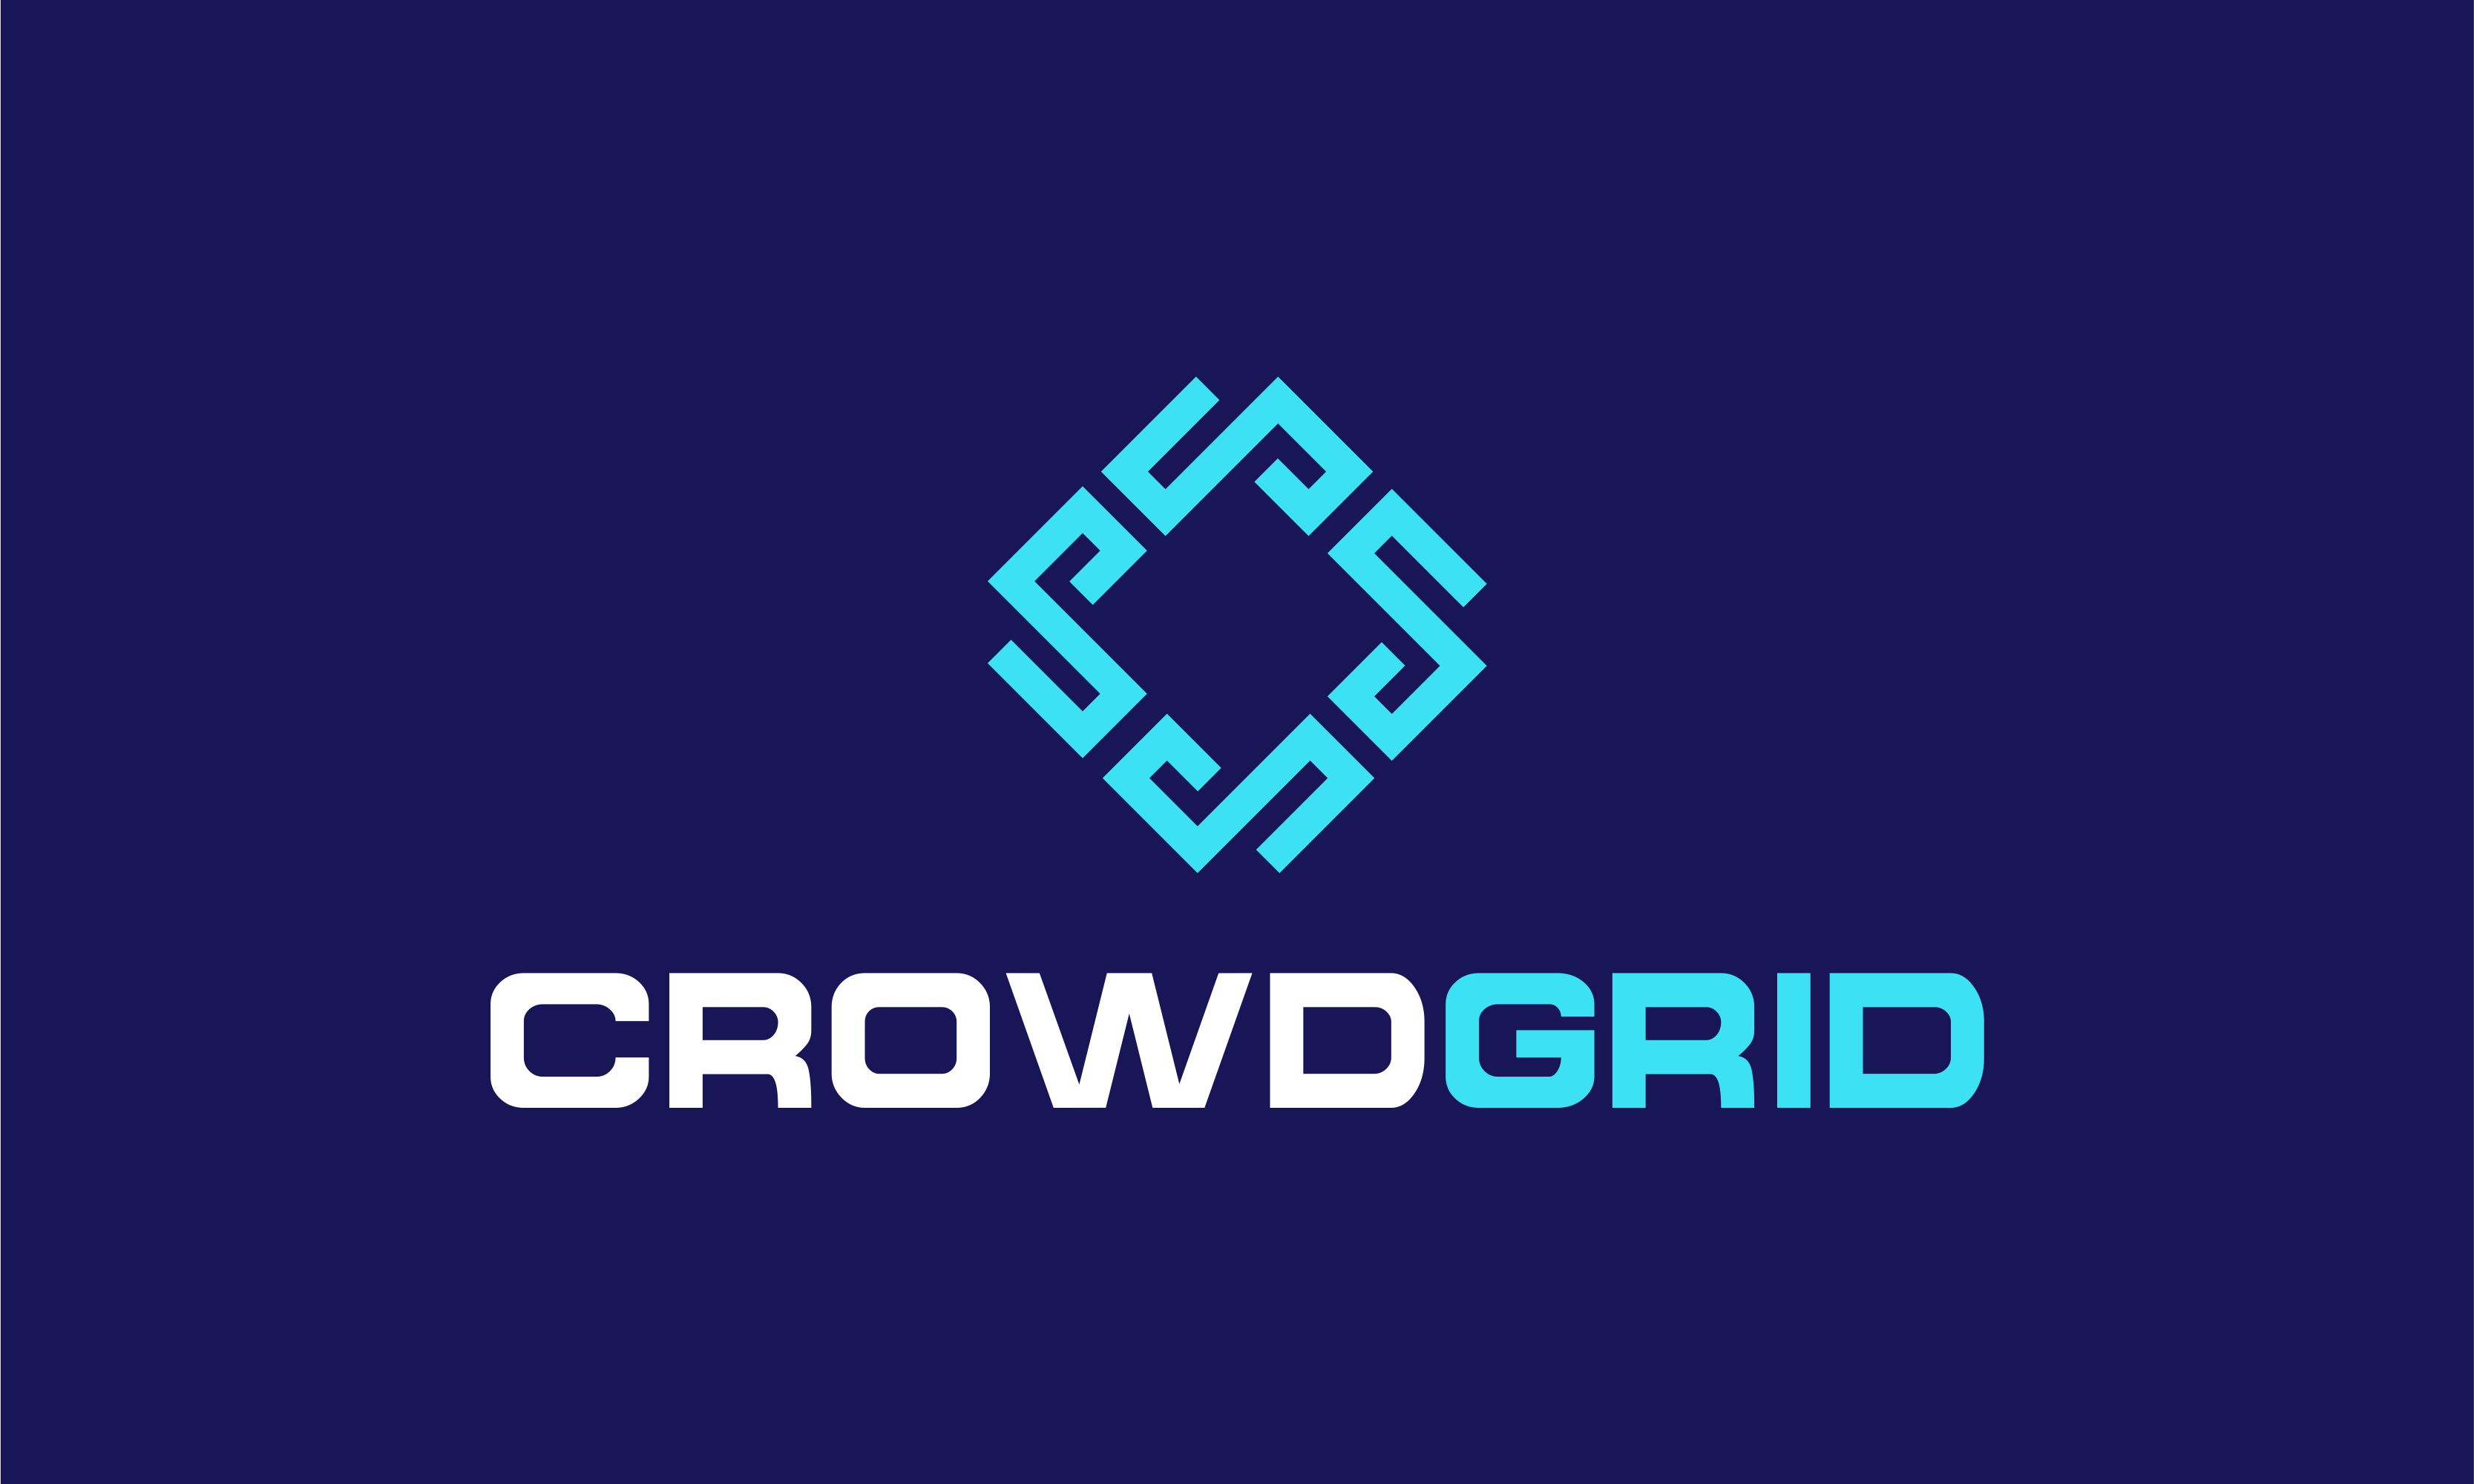 Crowdgrid